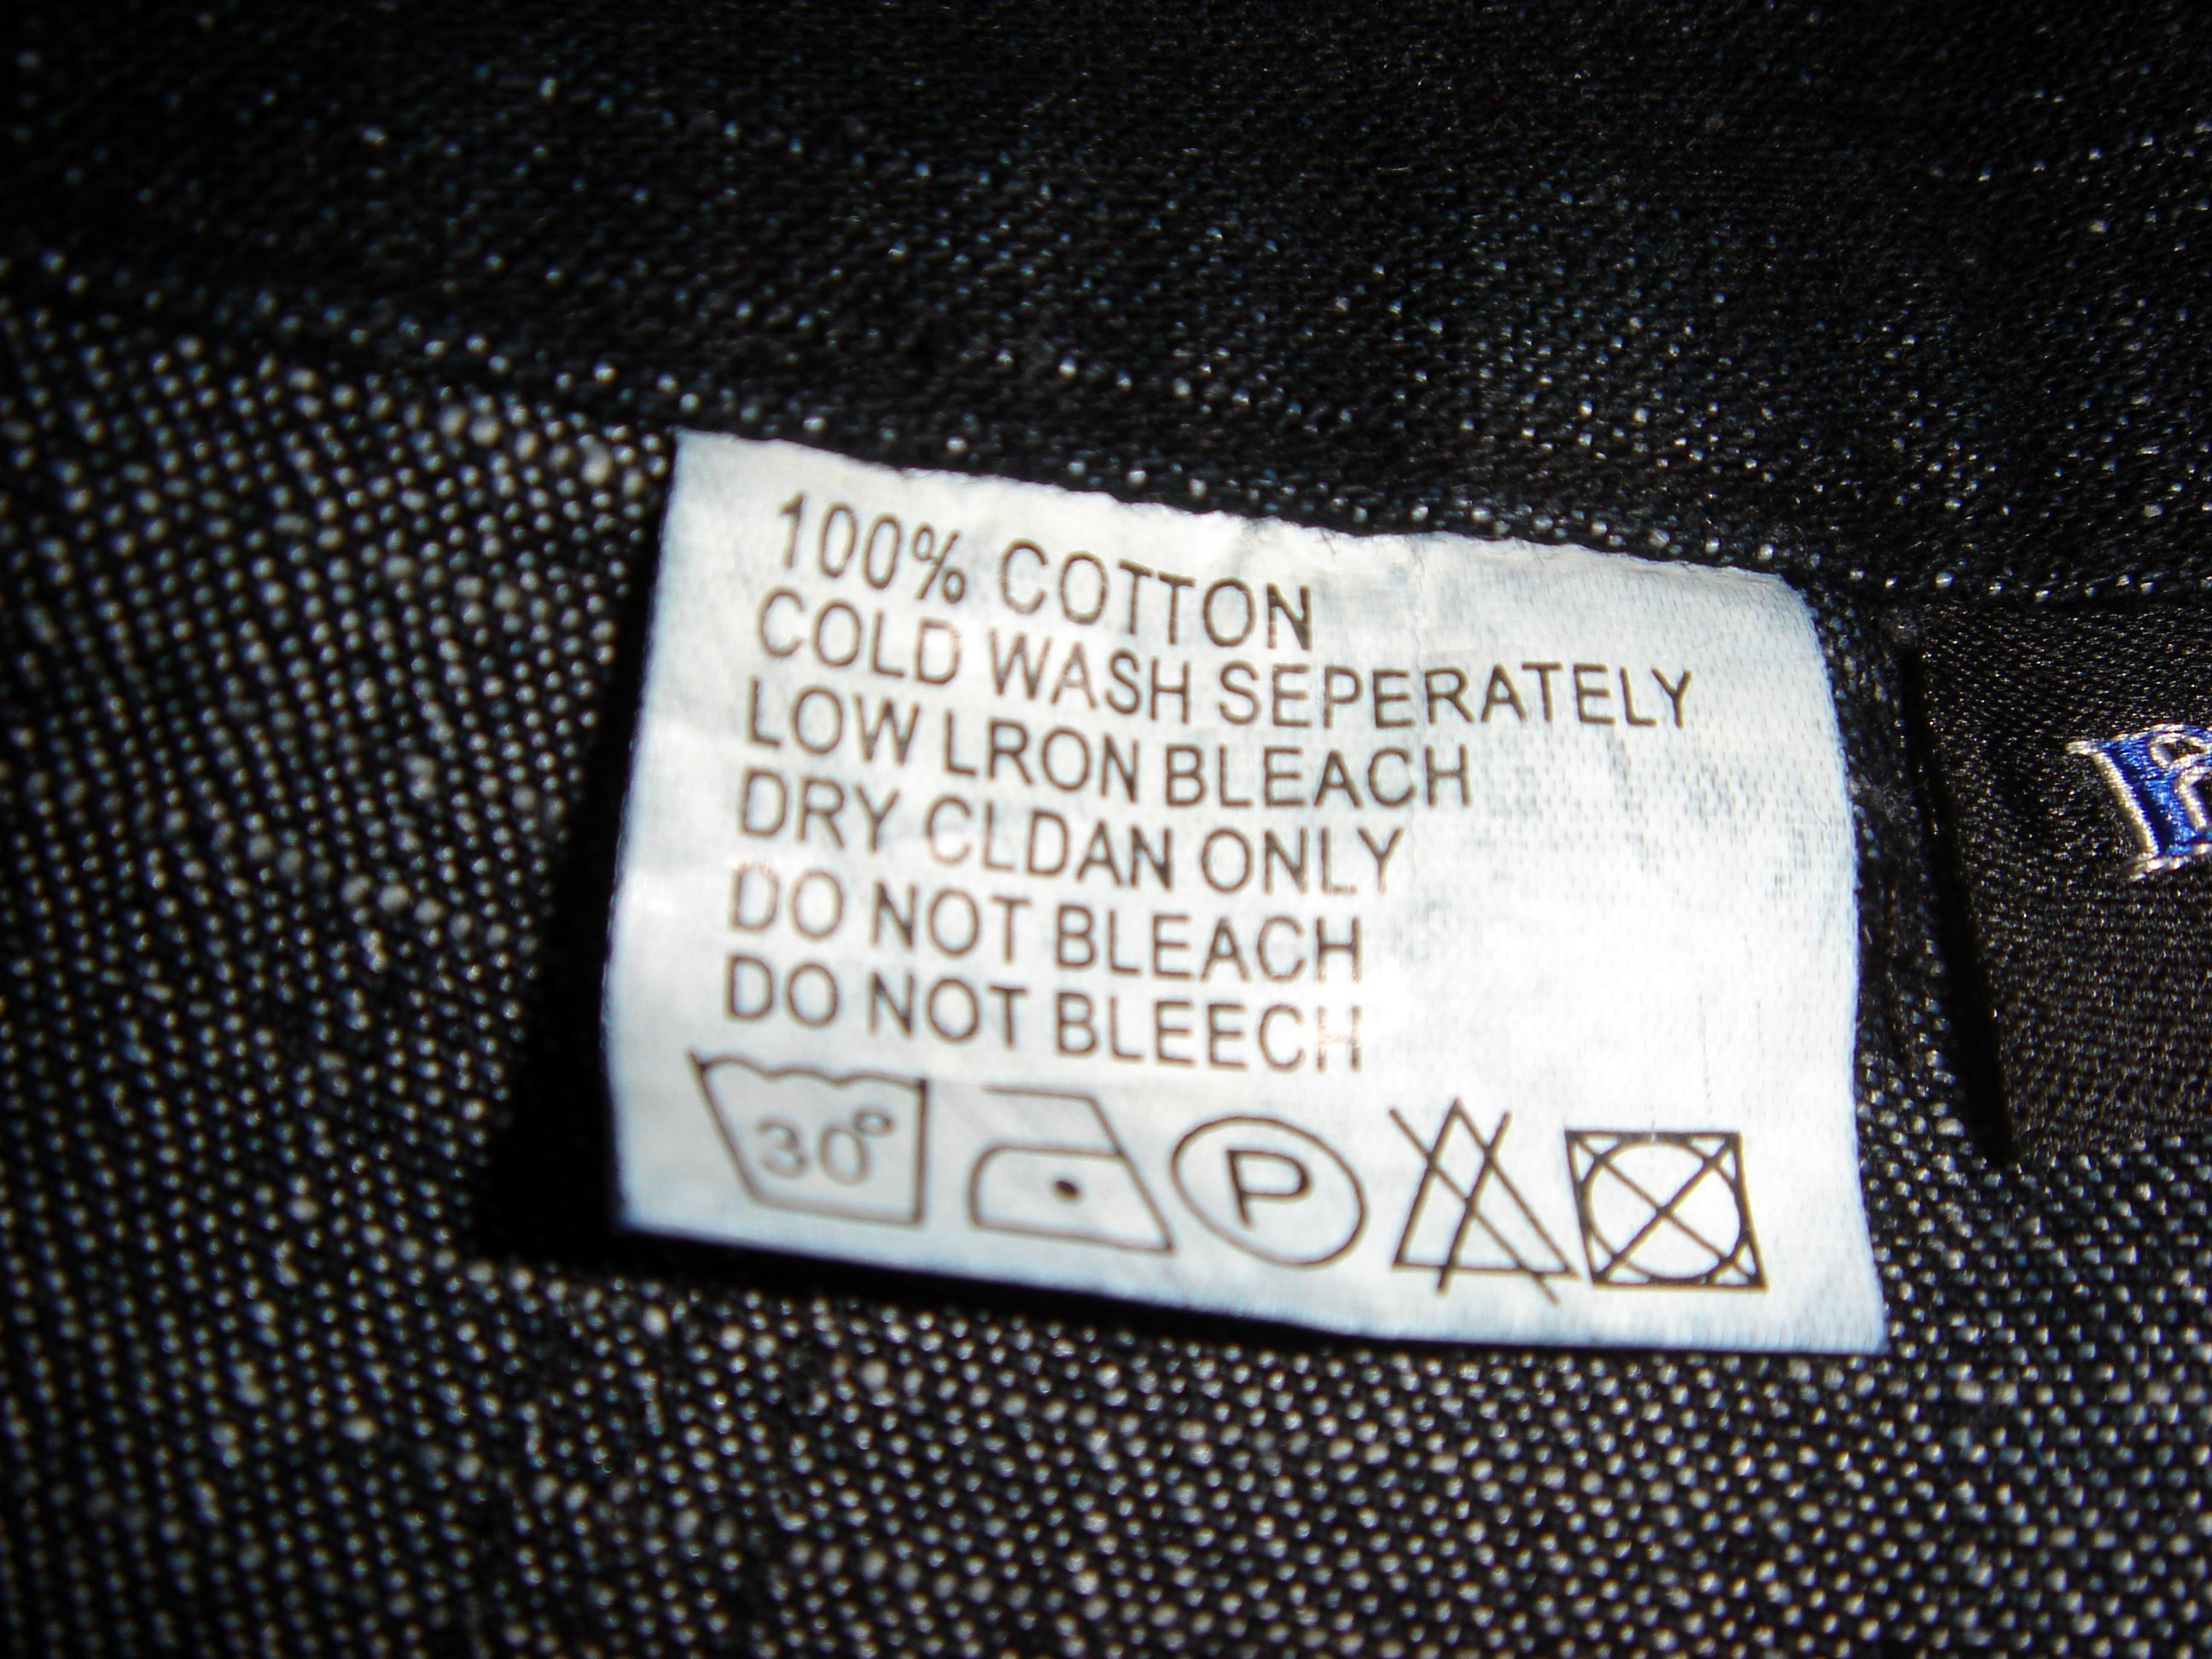 Leather jacket label